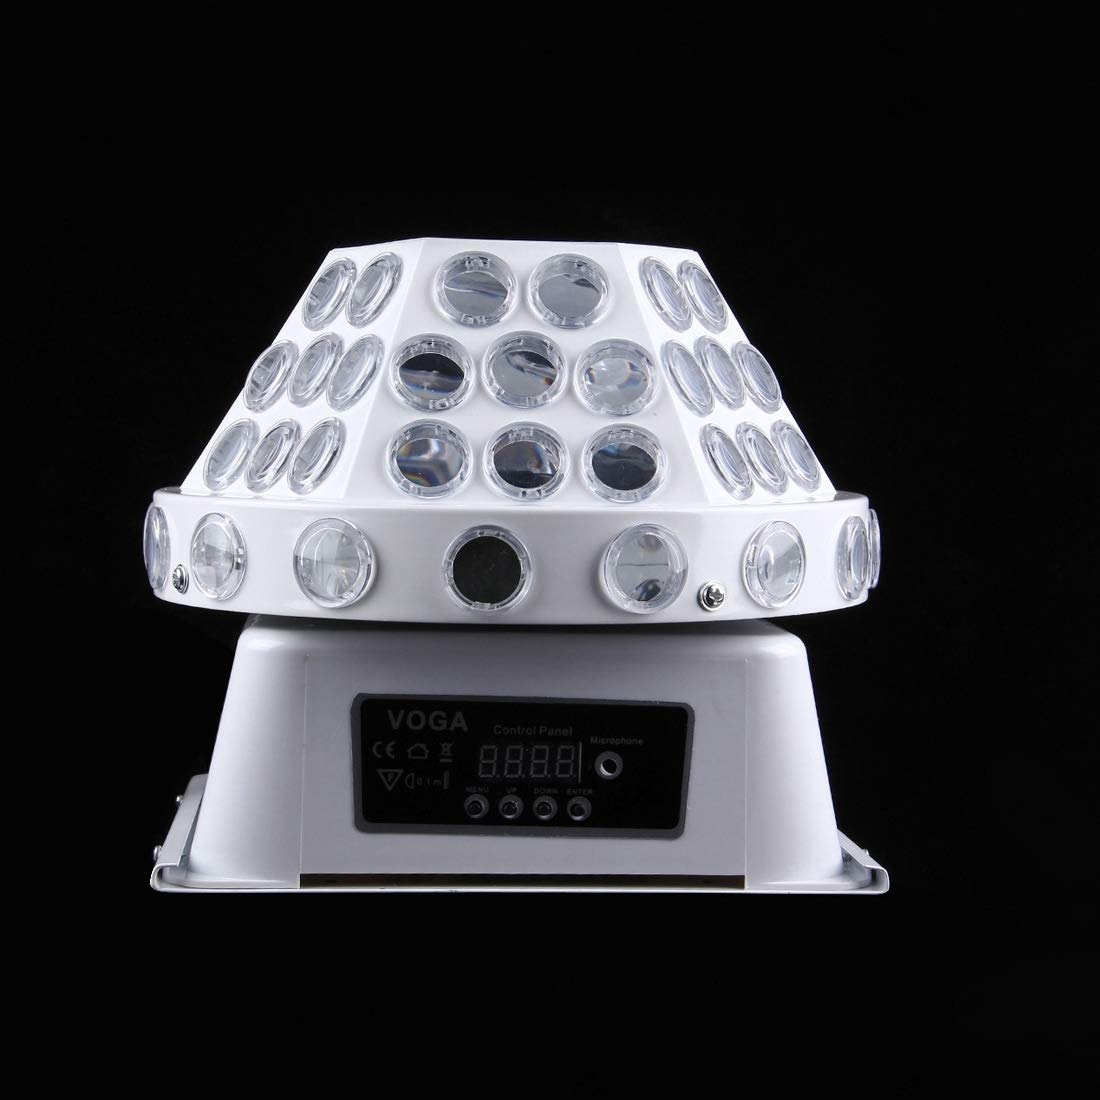 stage lighting 30W Mushroom Magic Ball LED Crystal Light, Master/Slave / DMX512 / Auto Run/Sound Control Modes, AC 220V by stage lighting (Image #2)